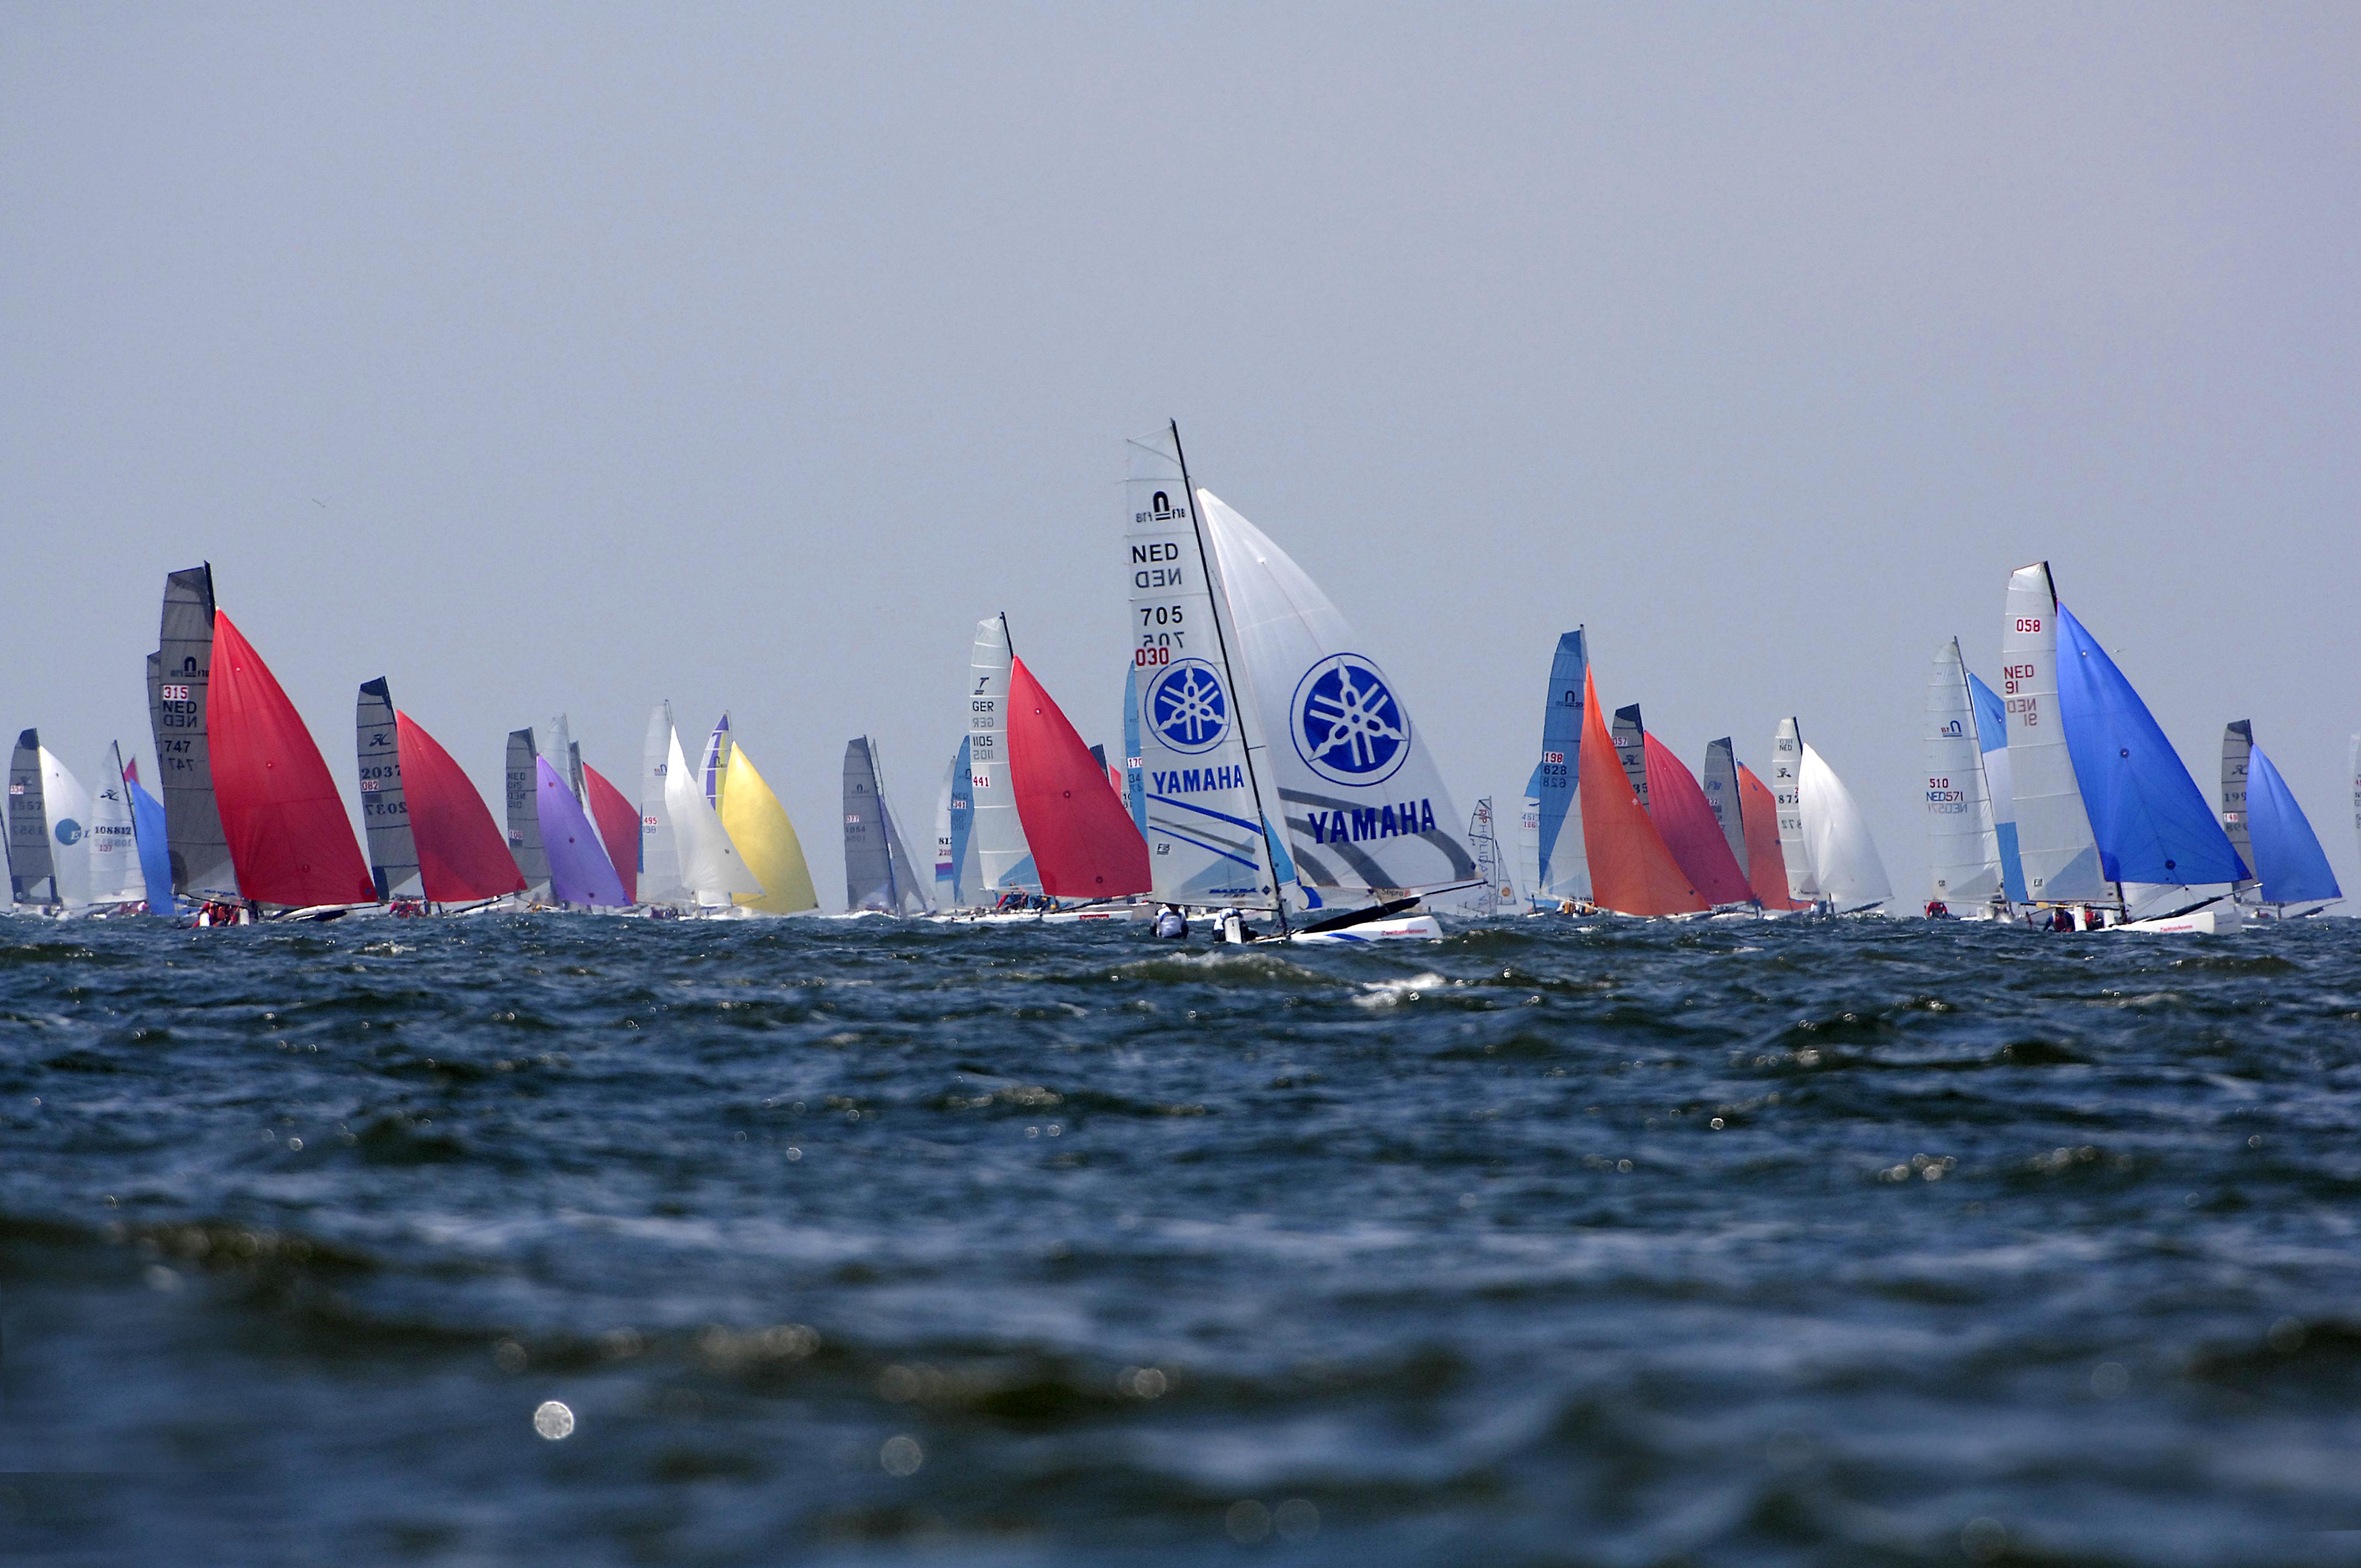 Zeilbote ronde on Texel VVV Texel